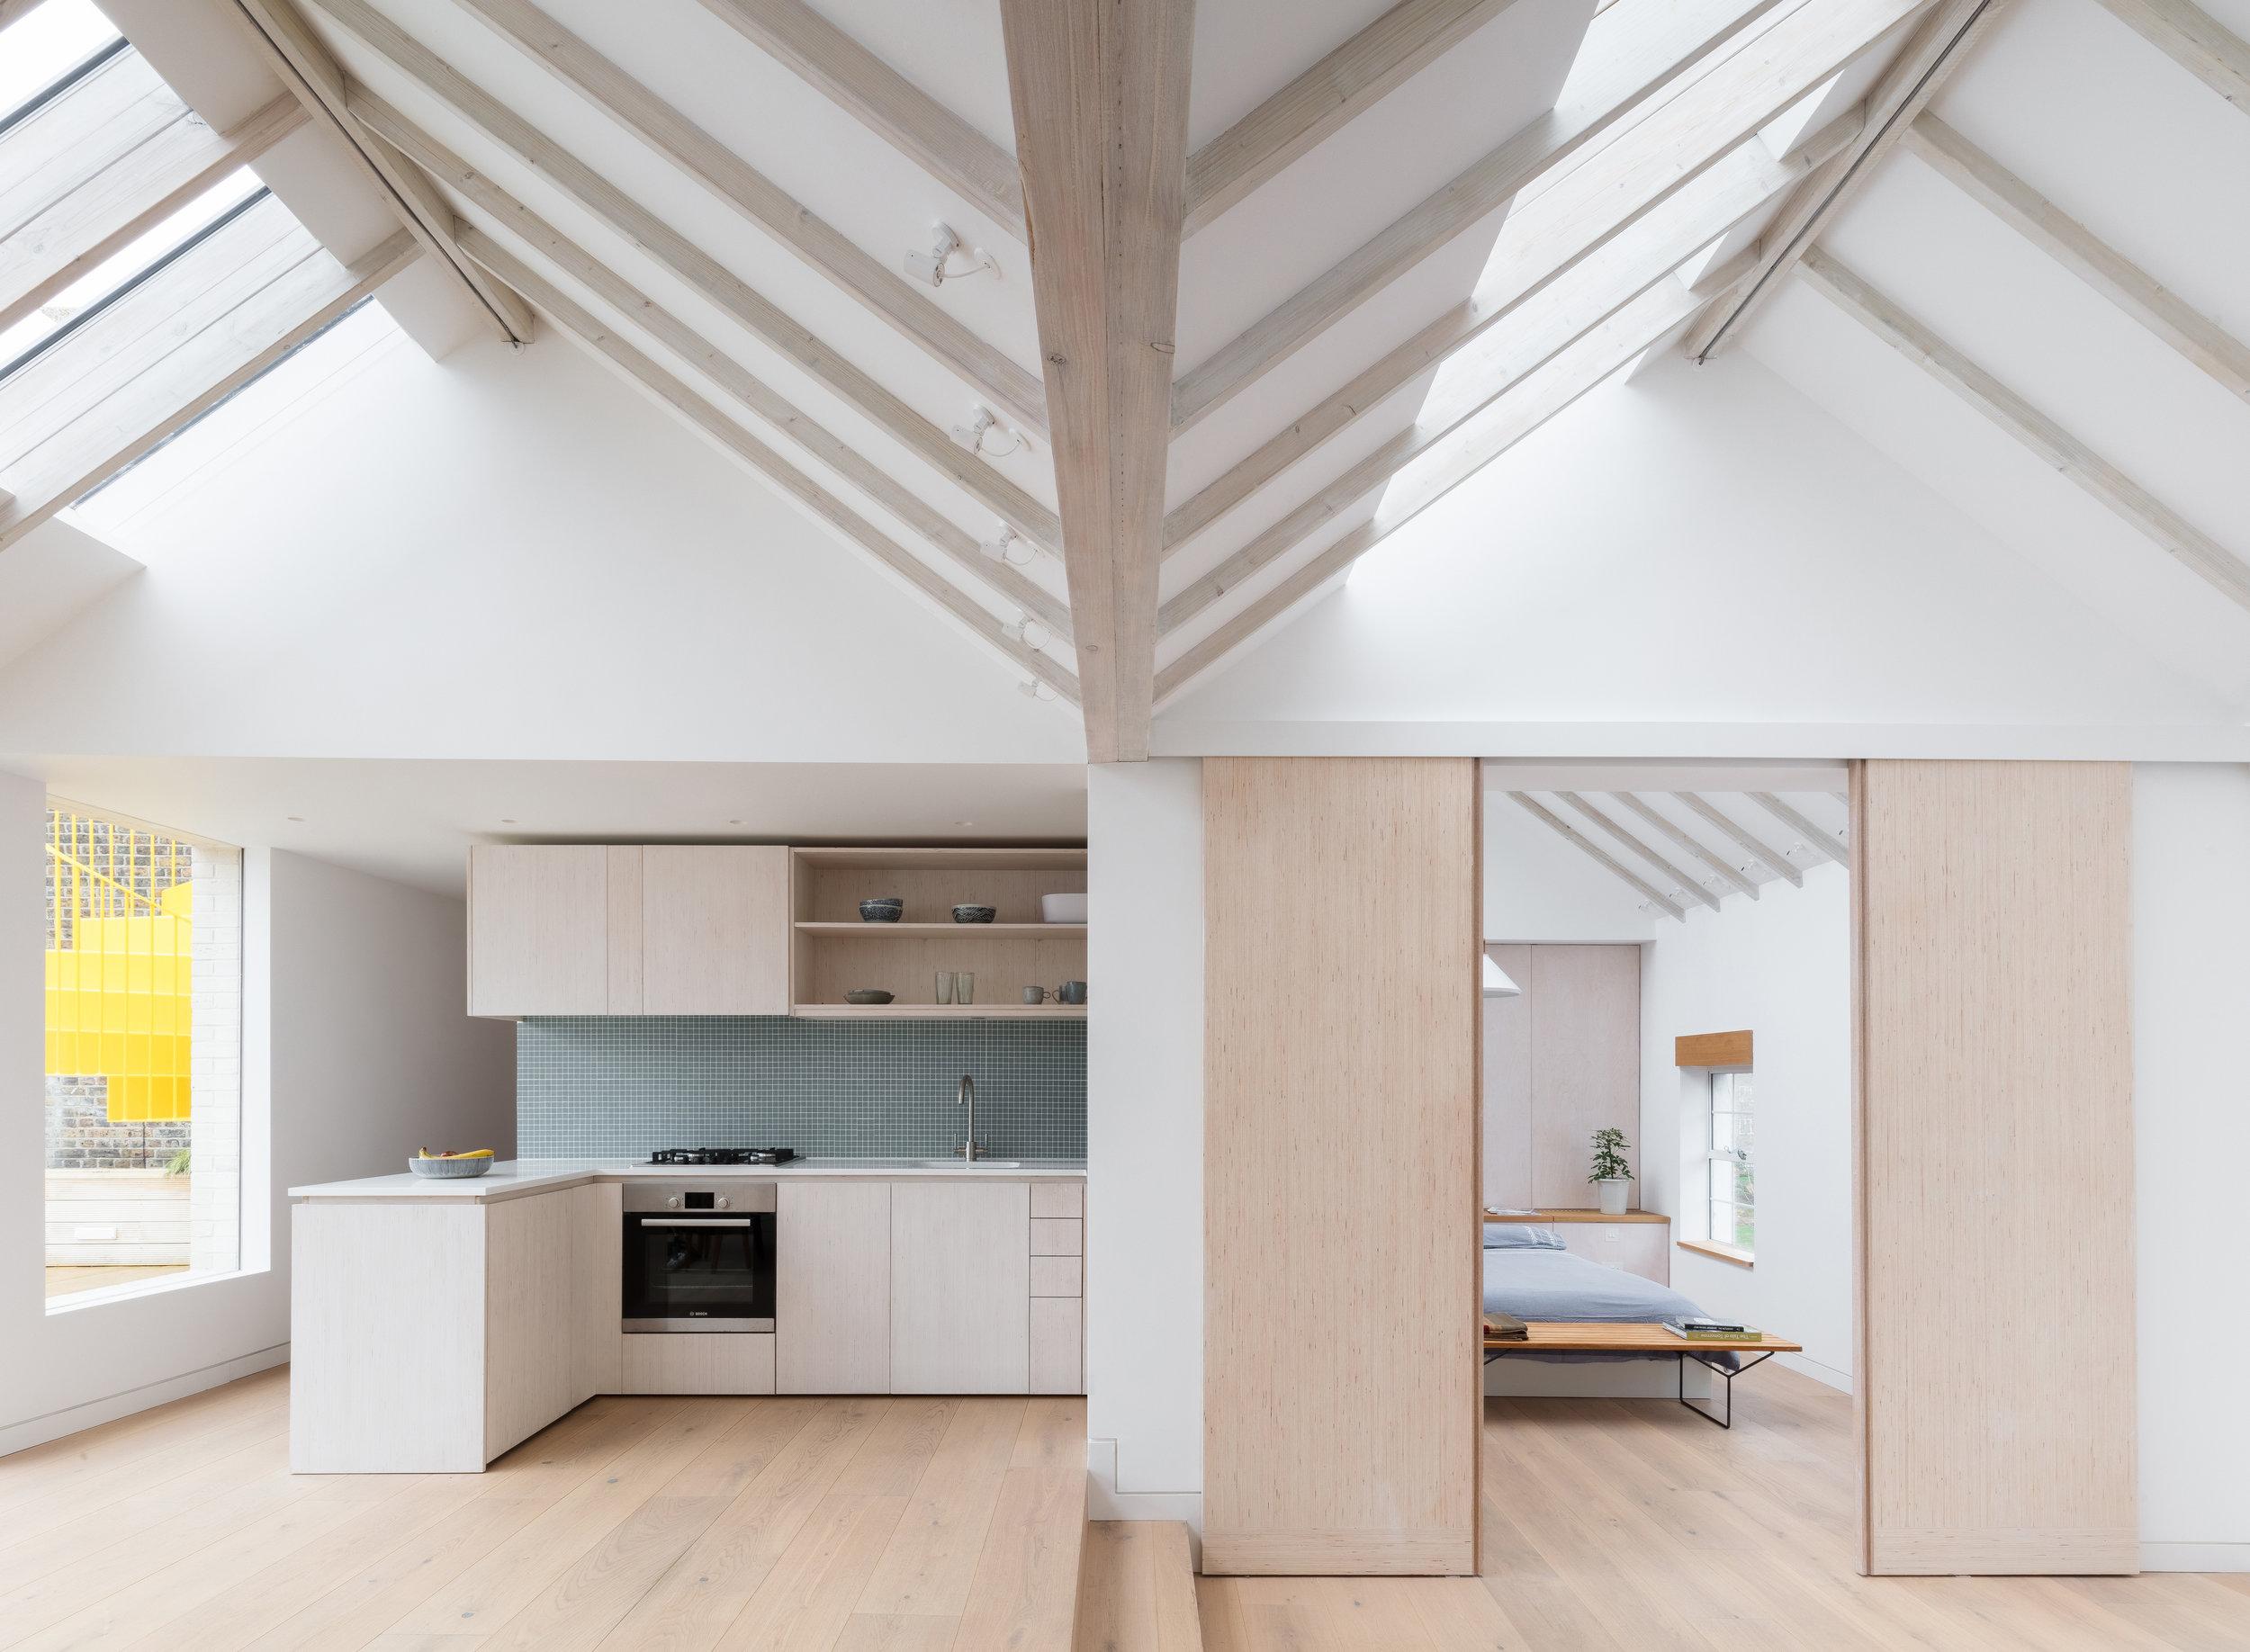 Vine Architecture Studio - Mile End Road-10 © Nicholas Worley.jpg